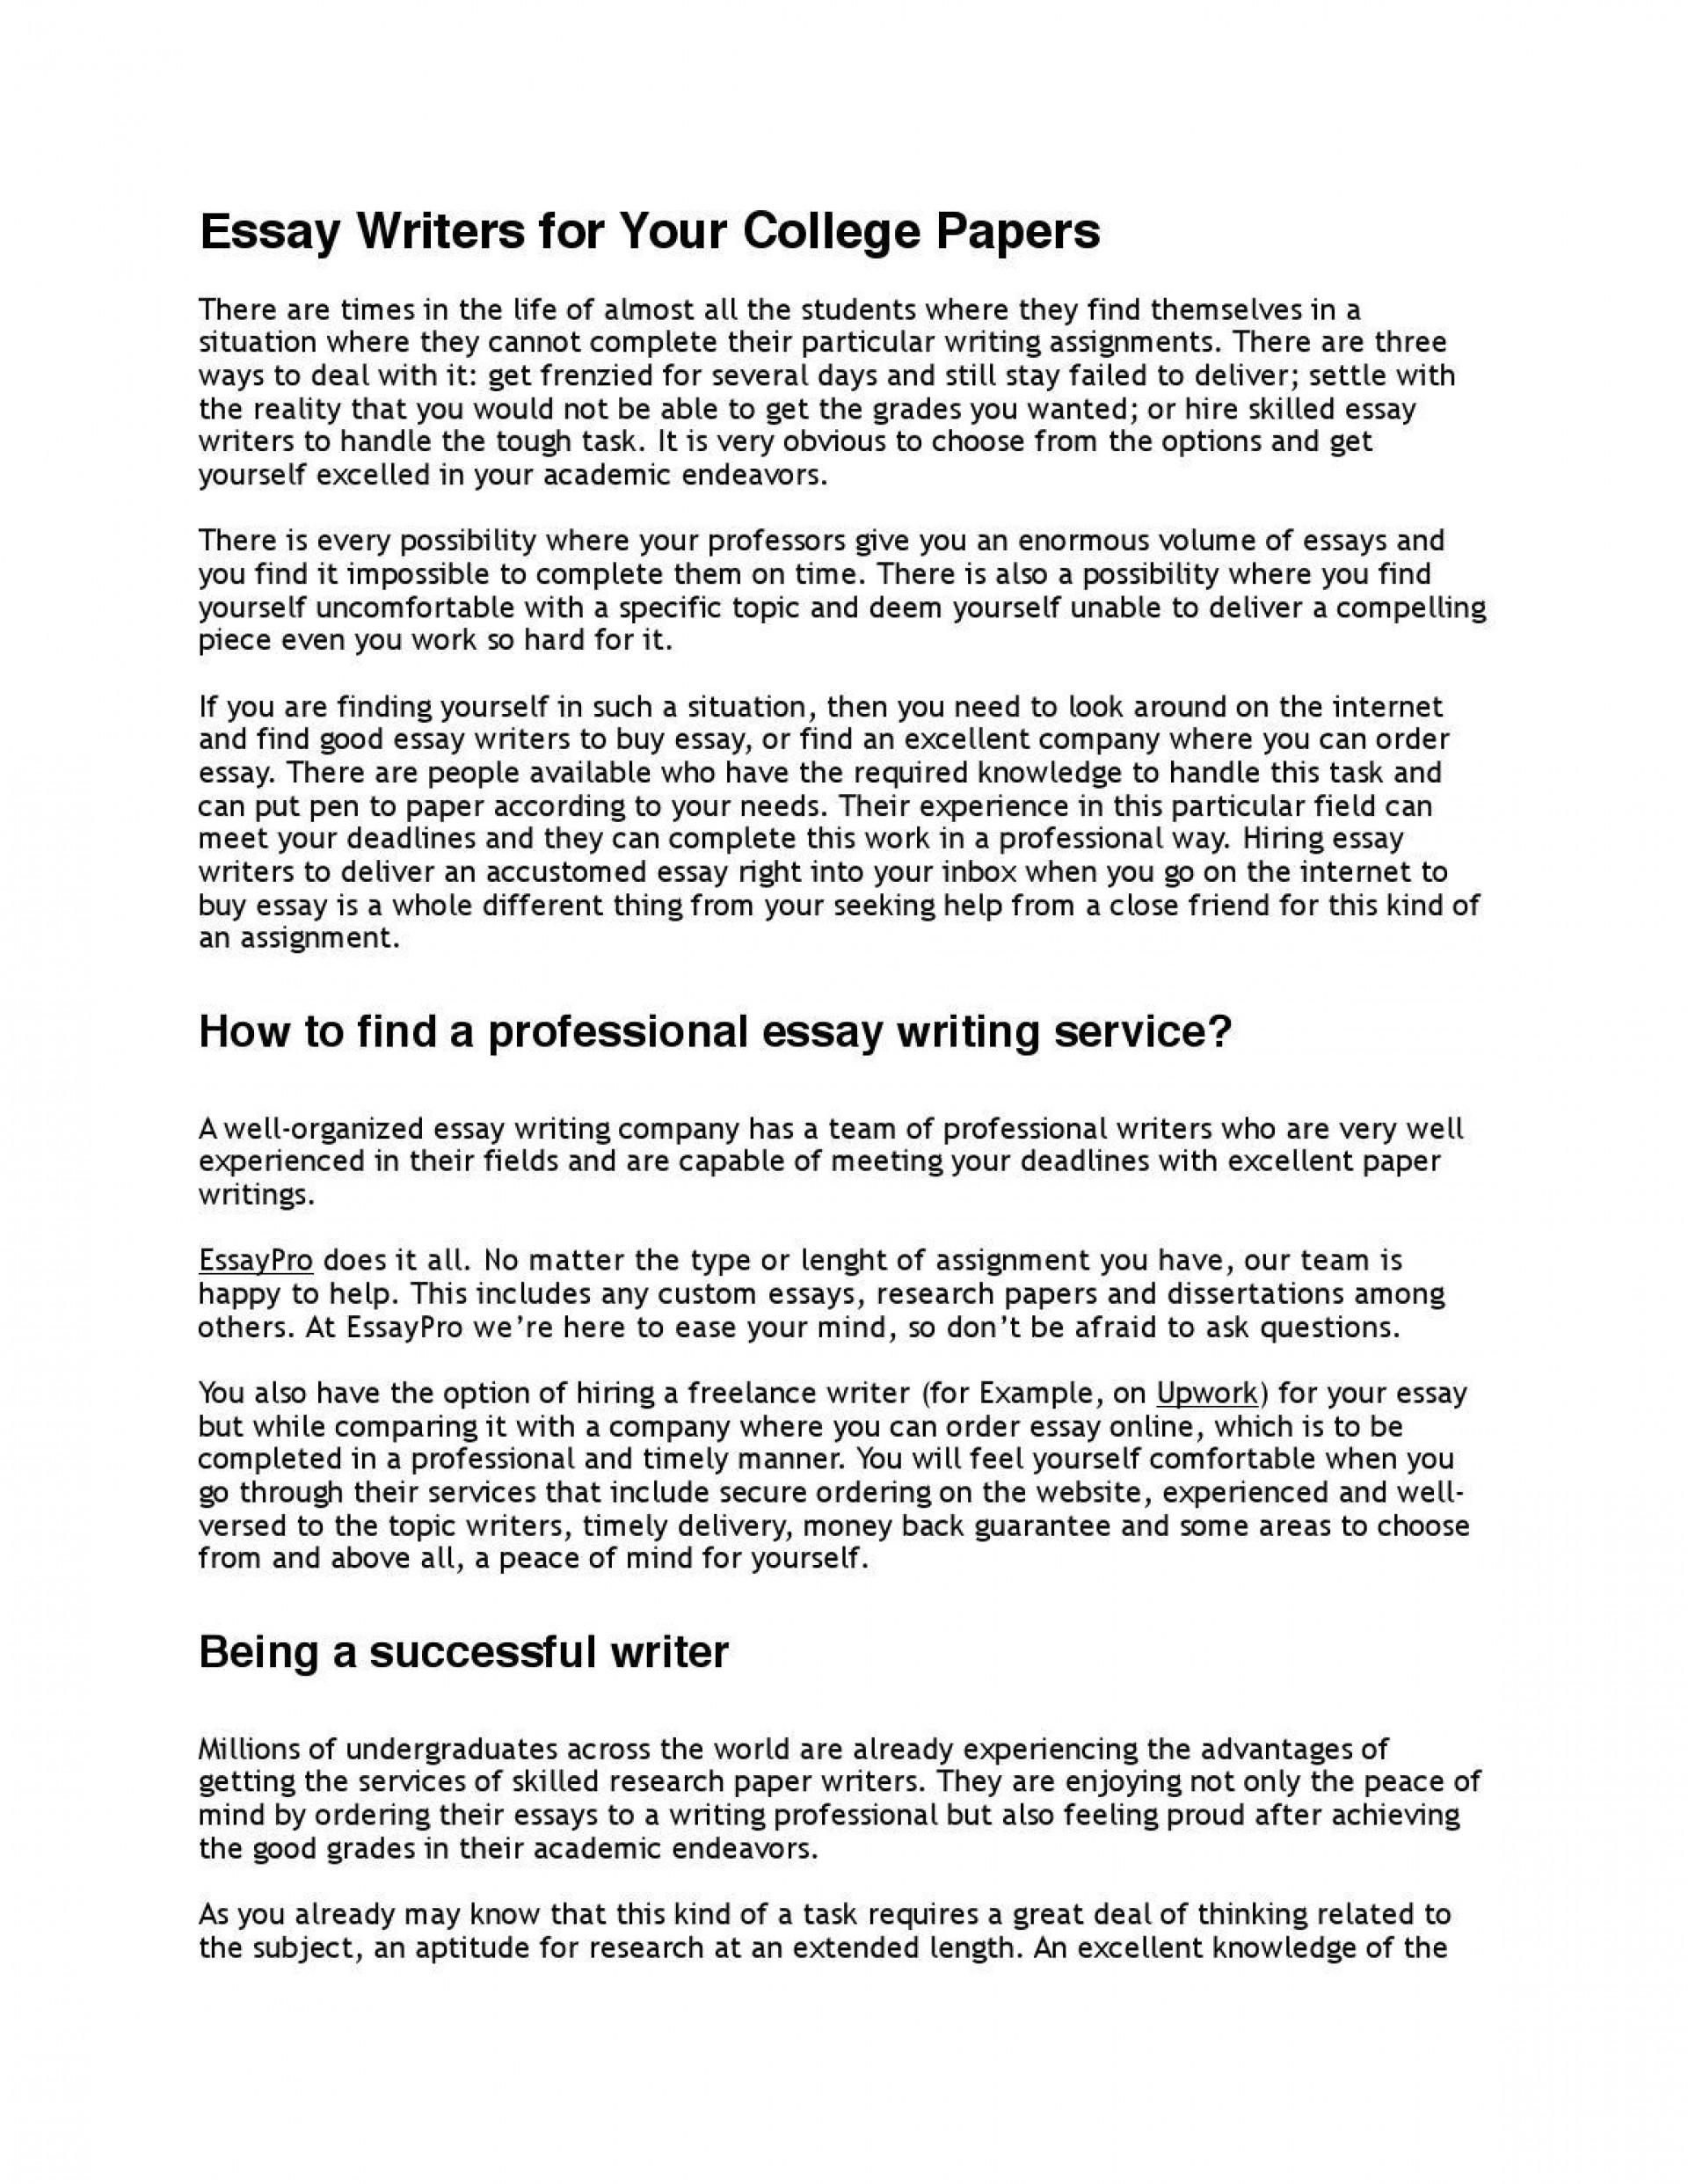 006 Who Are You Essay Page 1fit11562c1496ssl1 Rare Question Describe 1920